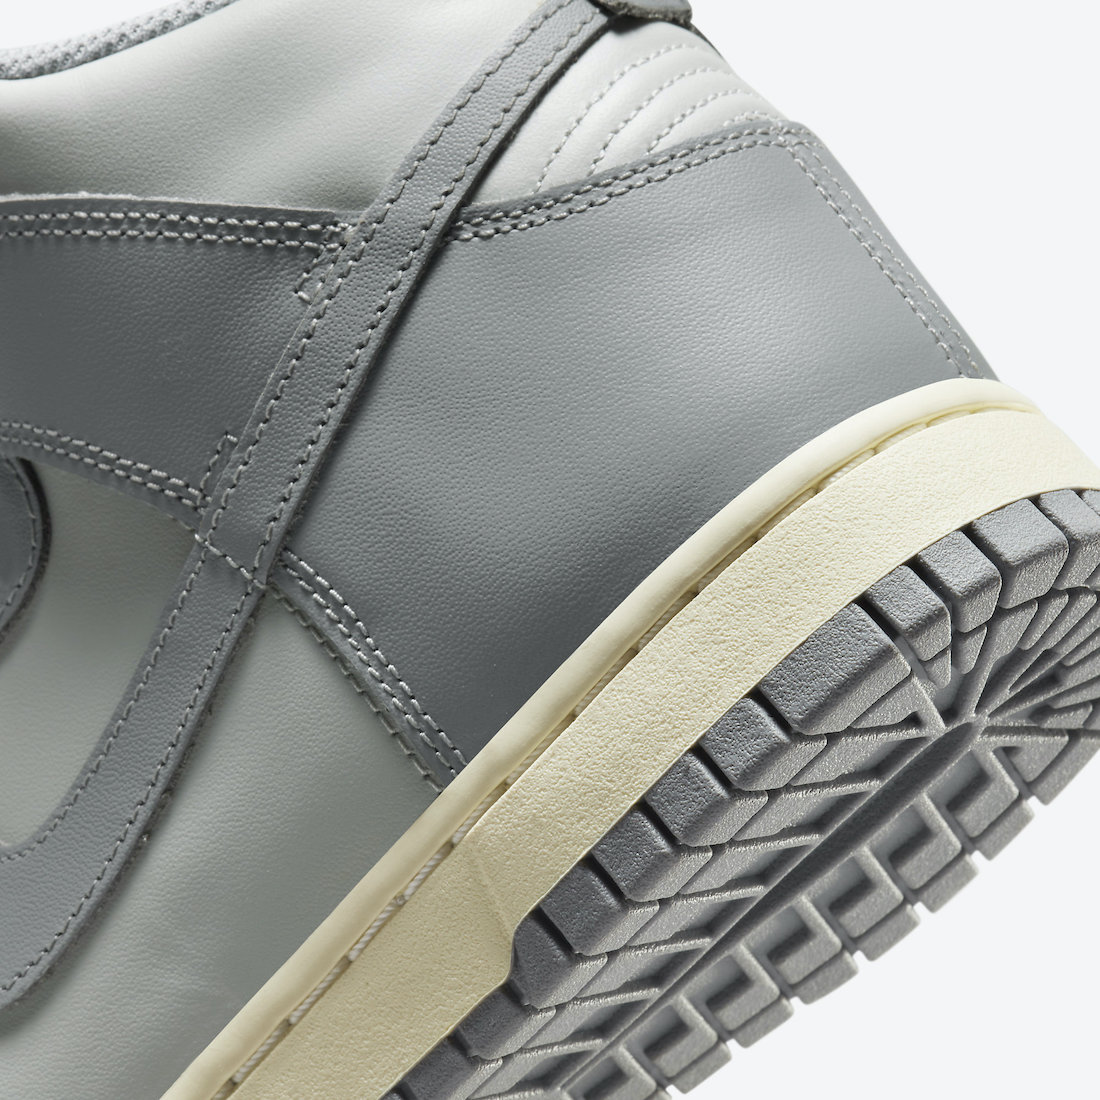 Nike,Dunk High,DD1869-001  经典「烟灰色」!全新 Nike Dunk High 官图曝光!